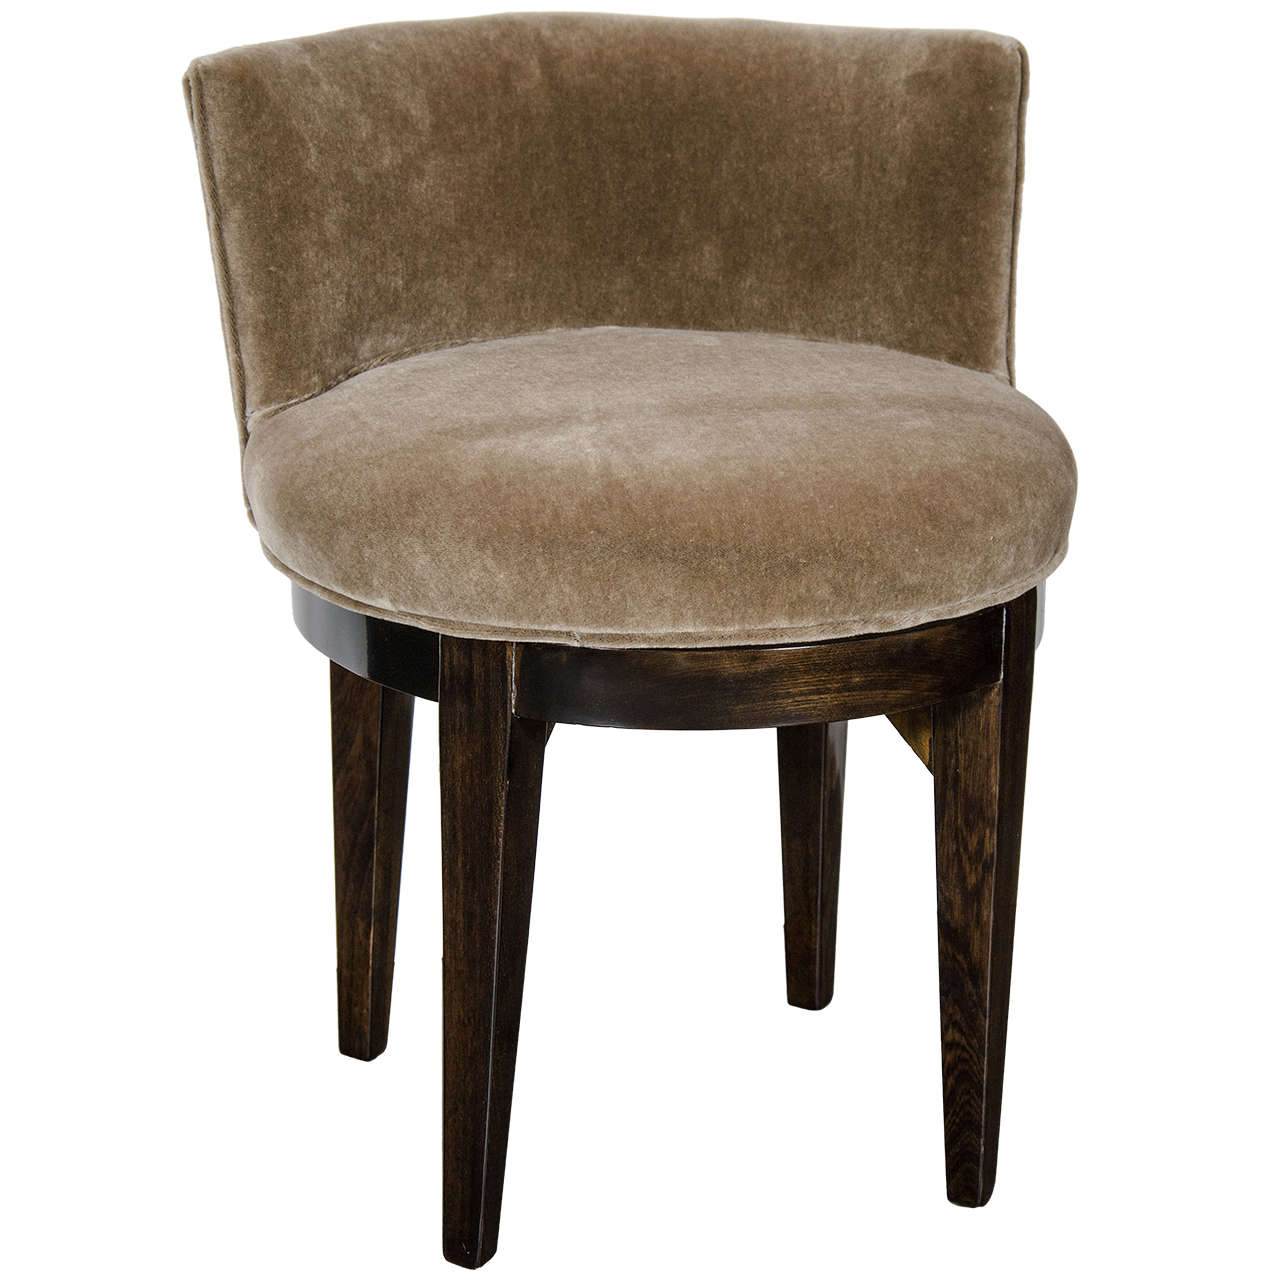 Art deco swivel vanity stool in ebonized walnut and smoked topaz mohair at 1stdibs - Tall vanity chair ...